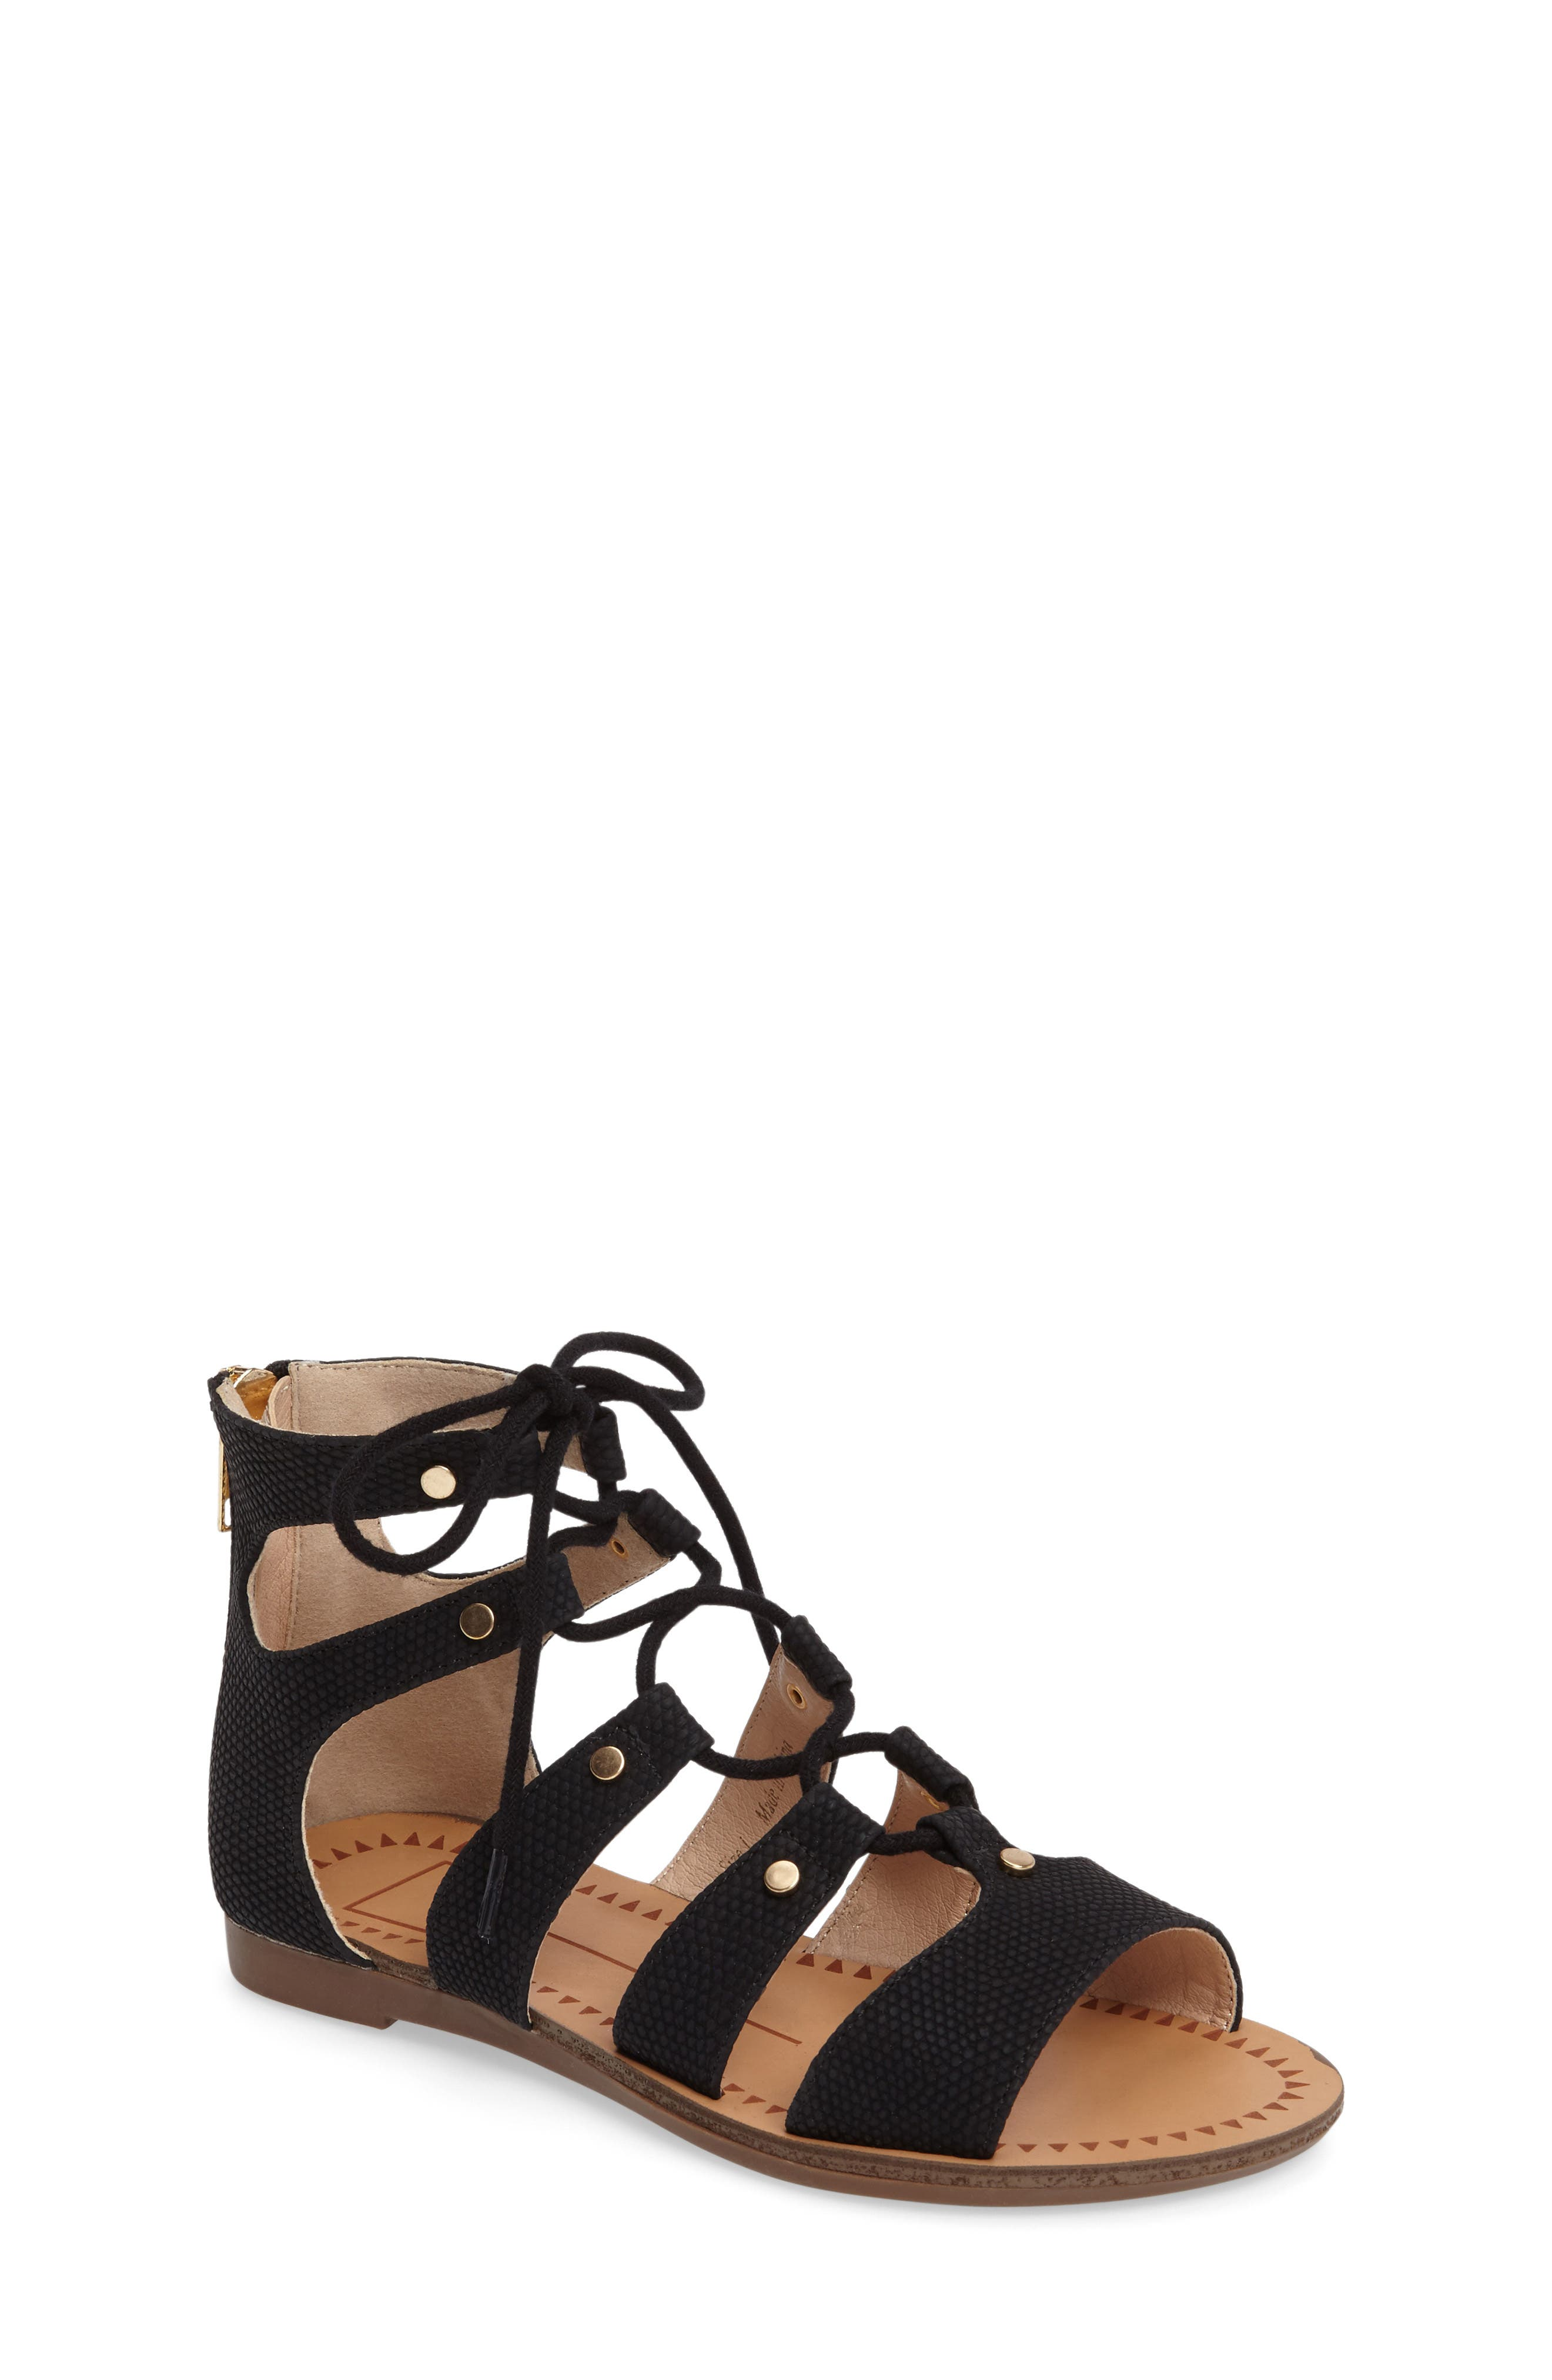 Dolce Vita Footwear 'Brooke' Ghillie Sandal (Toddler, Little Kid & Big Kid)